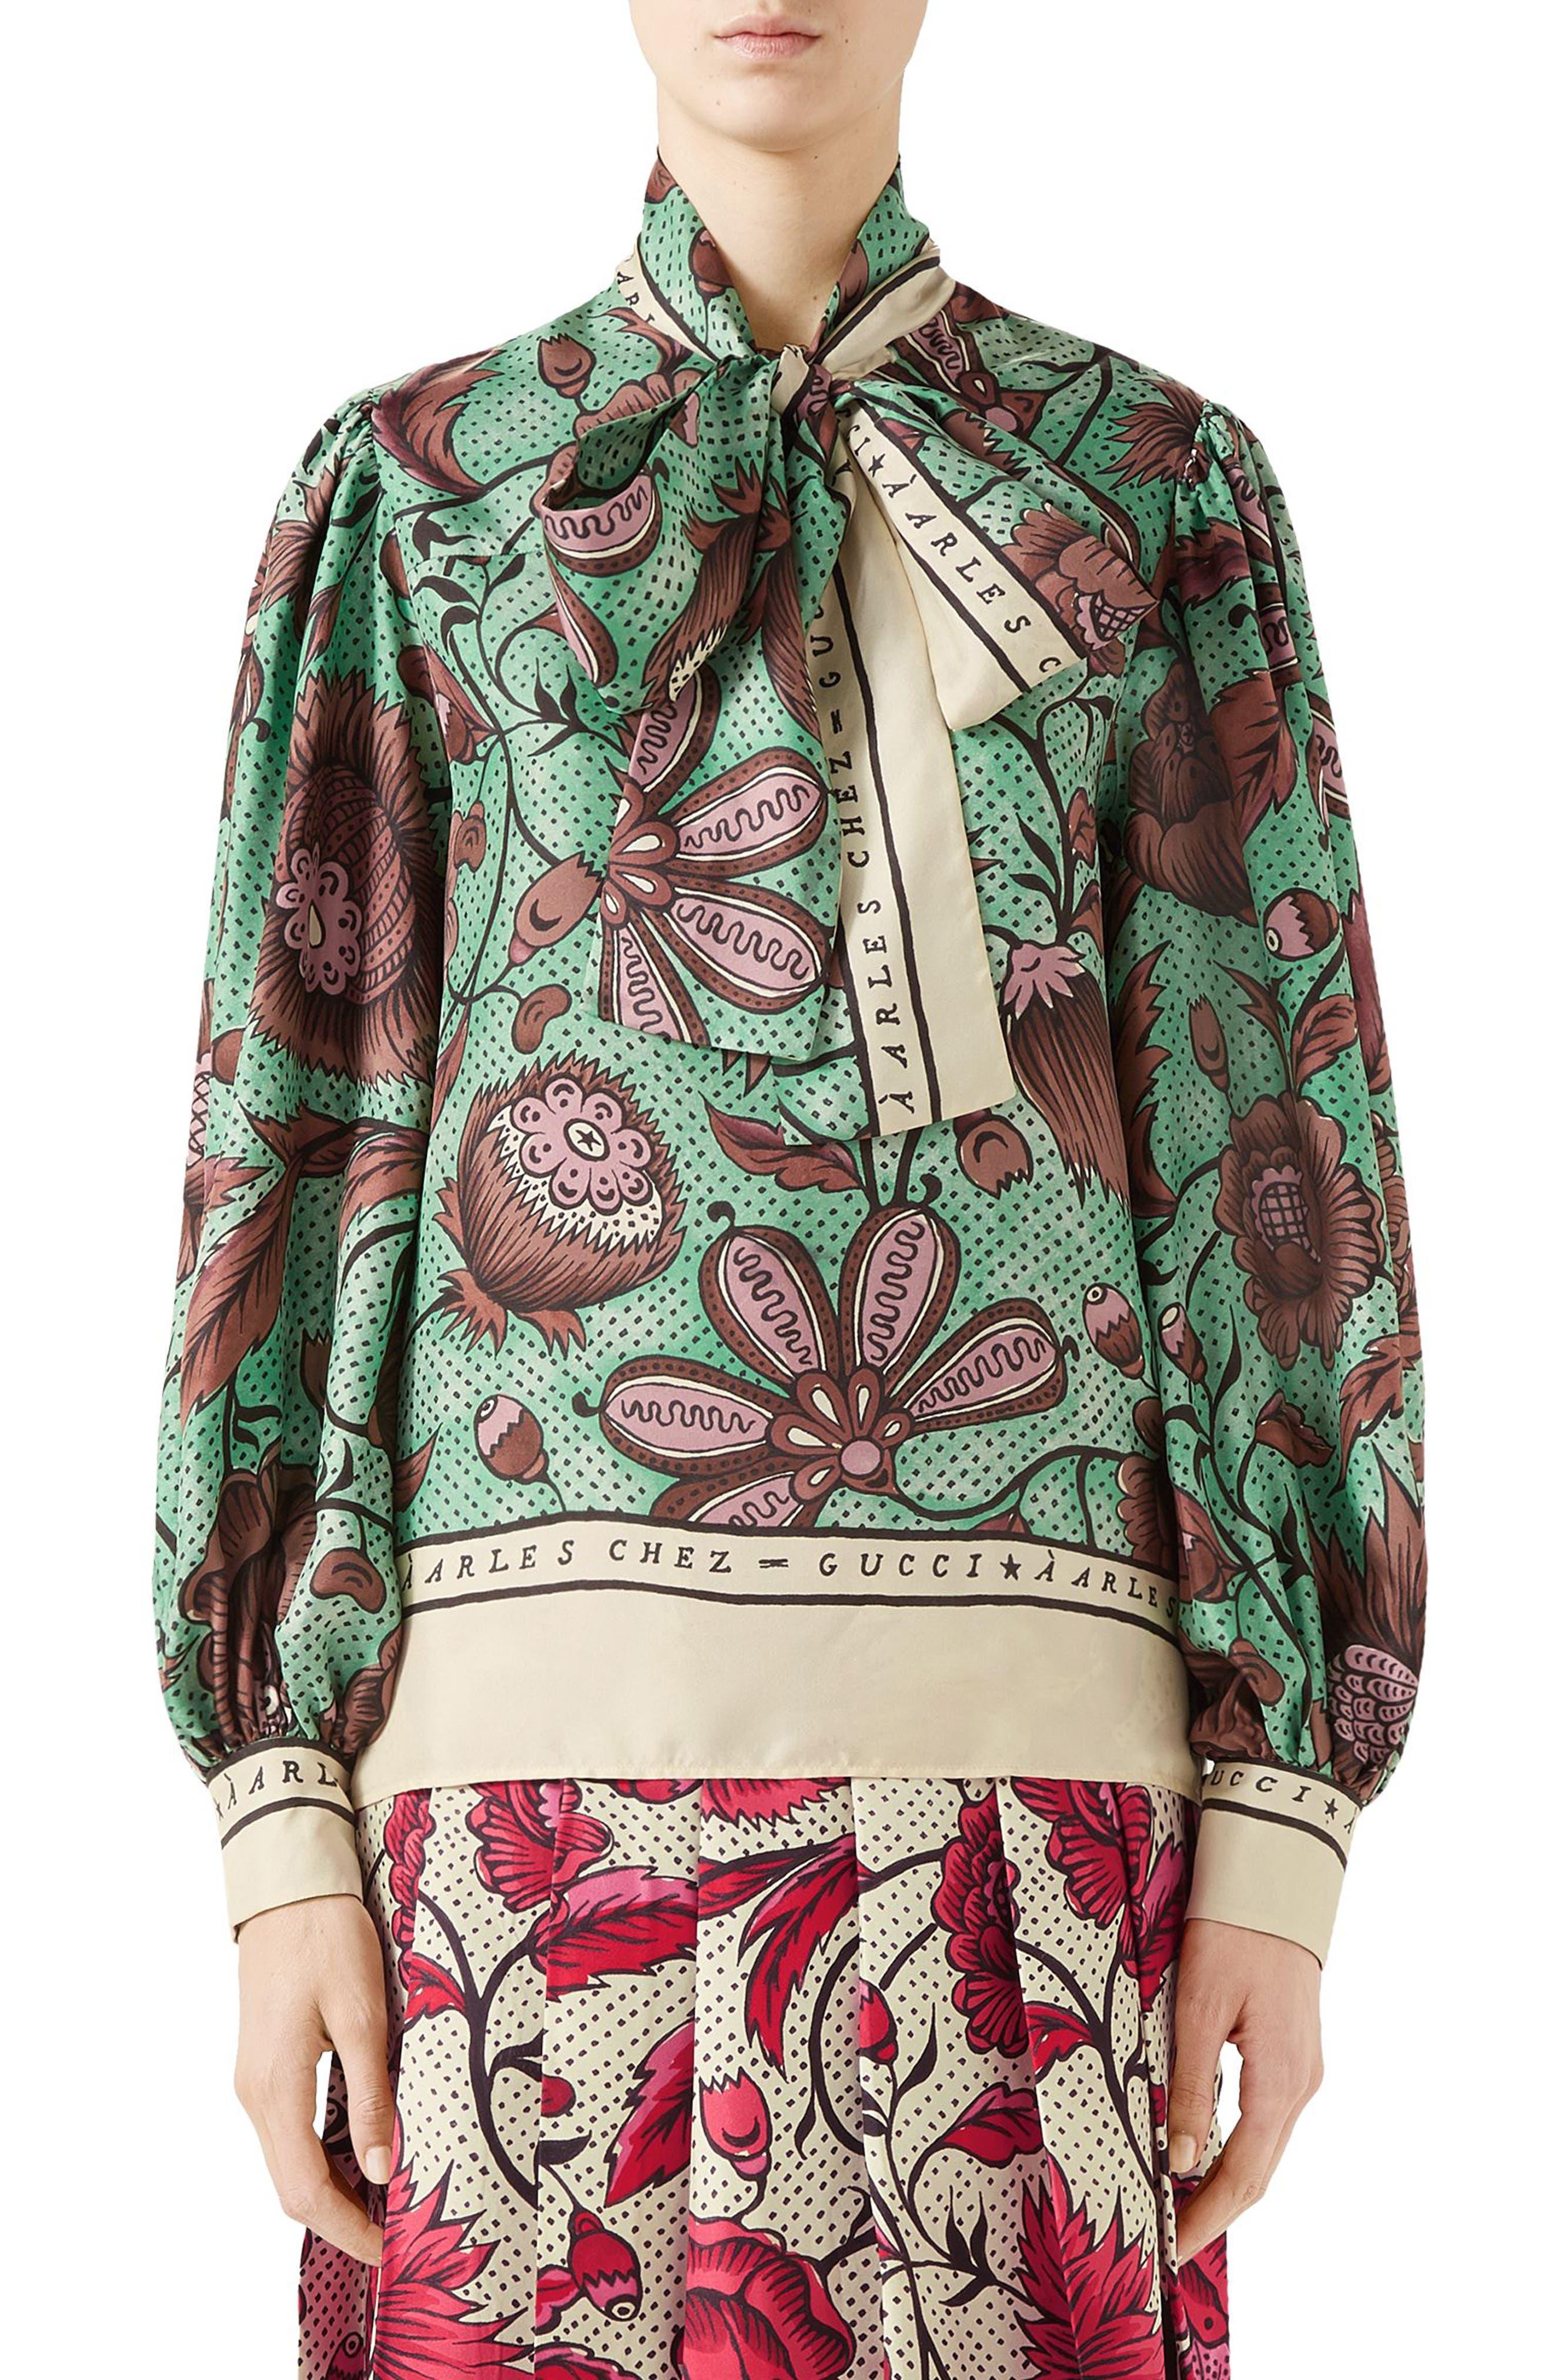 Watercolor Floral Print Tie Neck Silk Blouse,                             Main thumbnail 1, color,                             2125 BROWN/ GREEN PRINTED